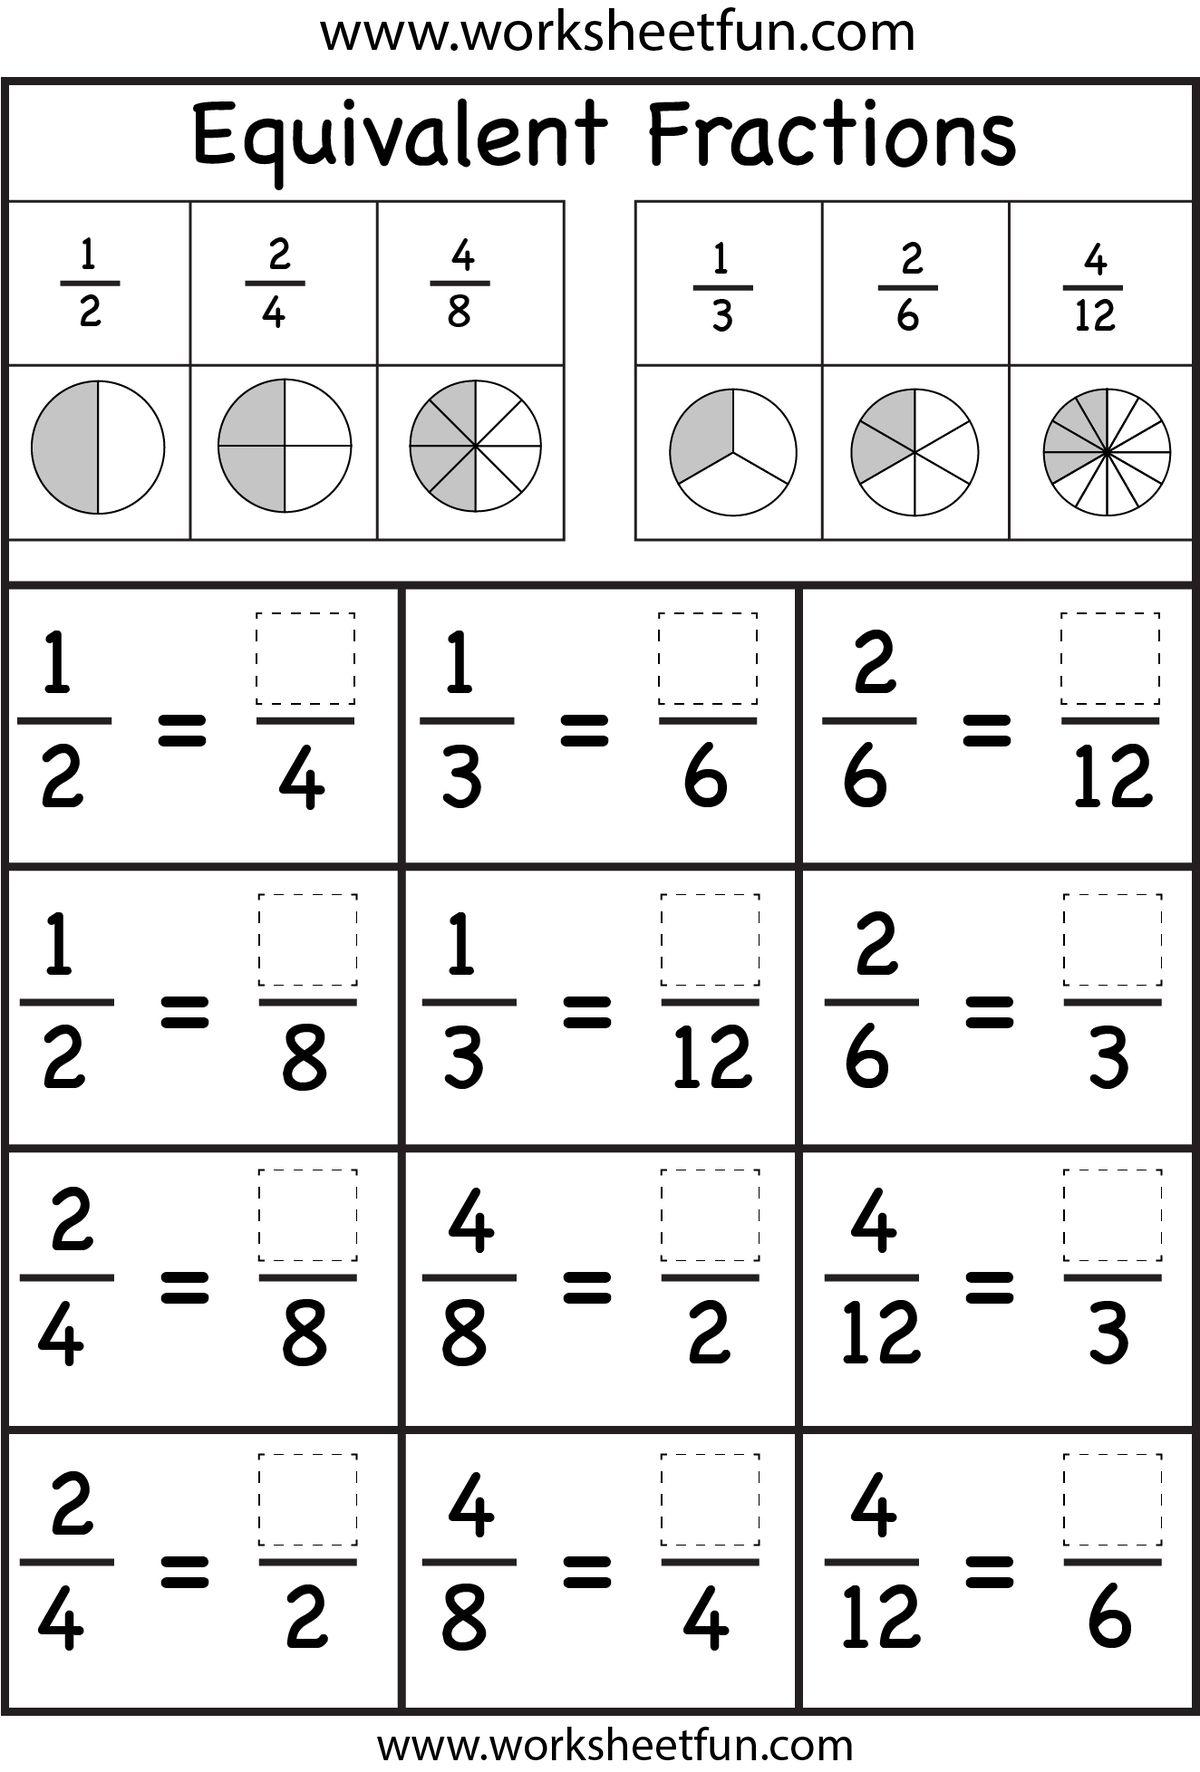 math worksheet : equivalent fractions worksheet  free printable worksheets : Early Years Maths Worksheets